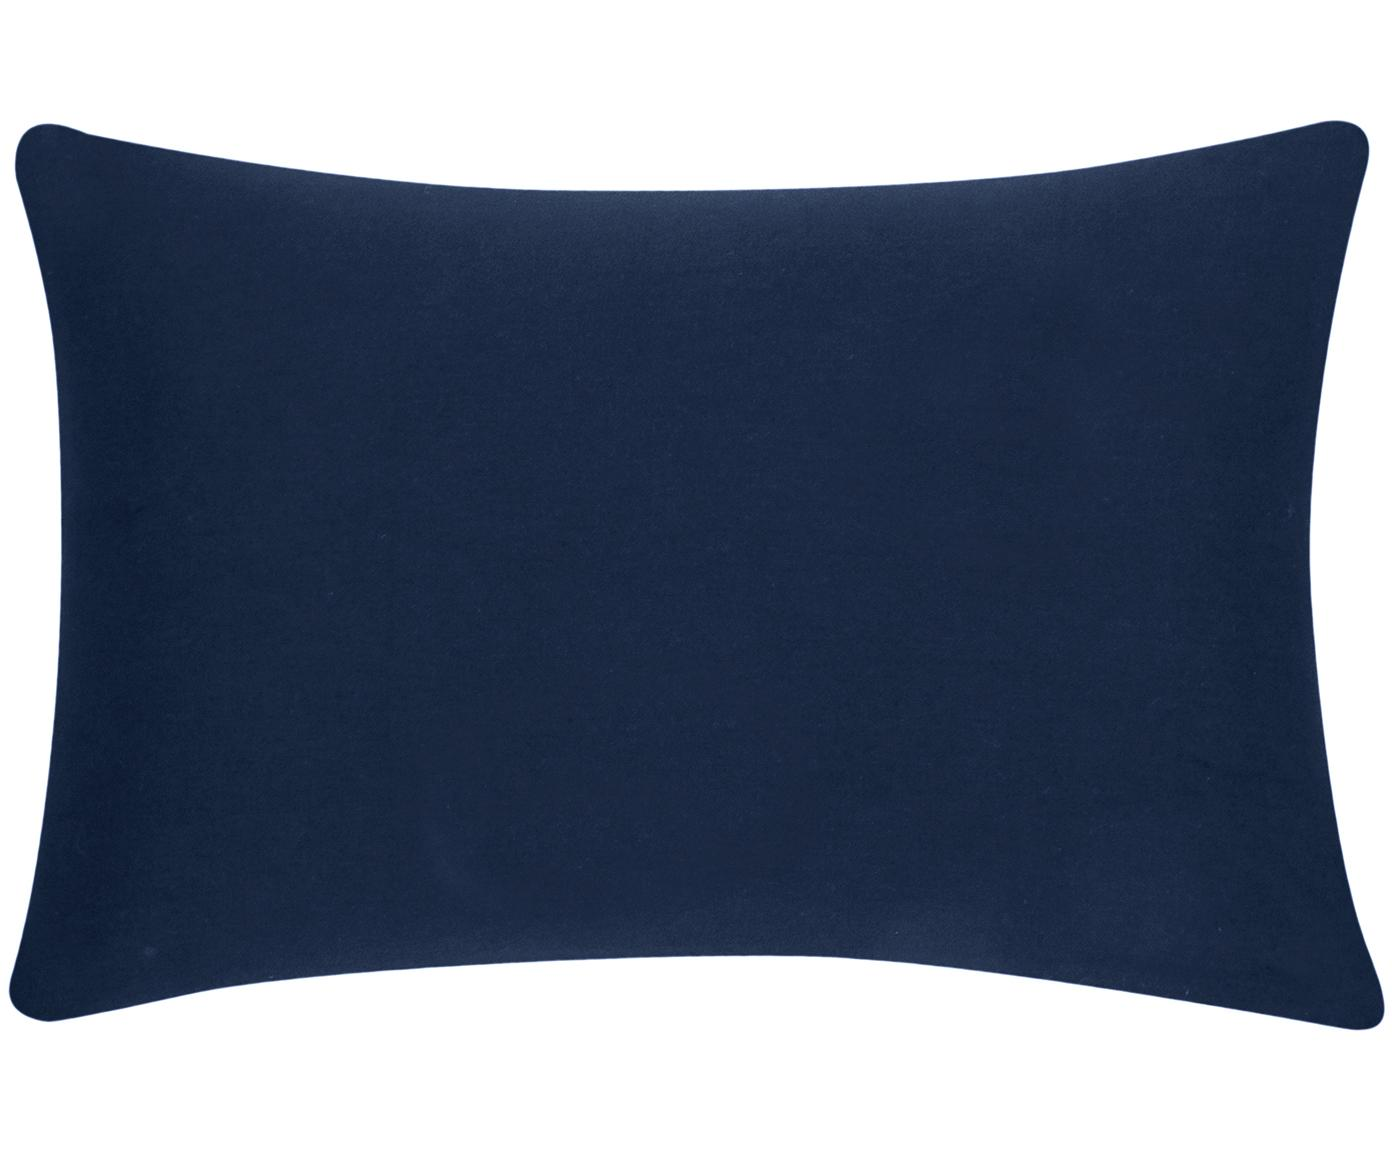 Federa arredo in cotone Mads, Cotone, Blu navy, Larg. 30 x Lung. 50 cm